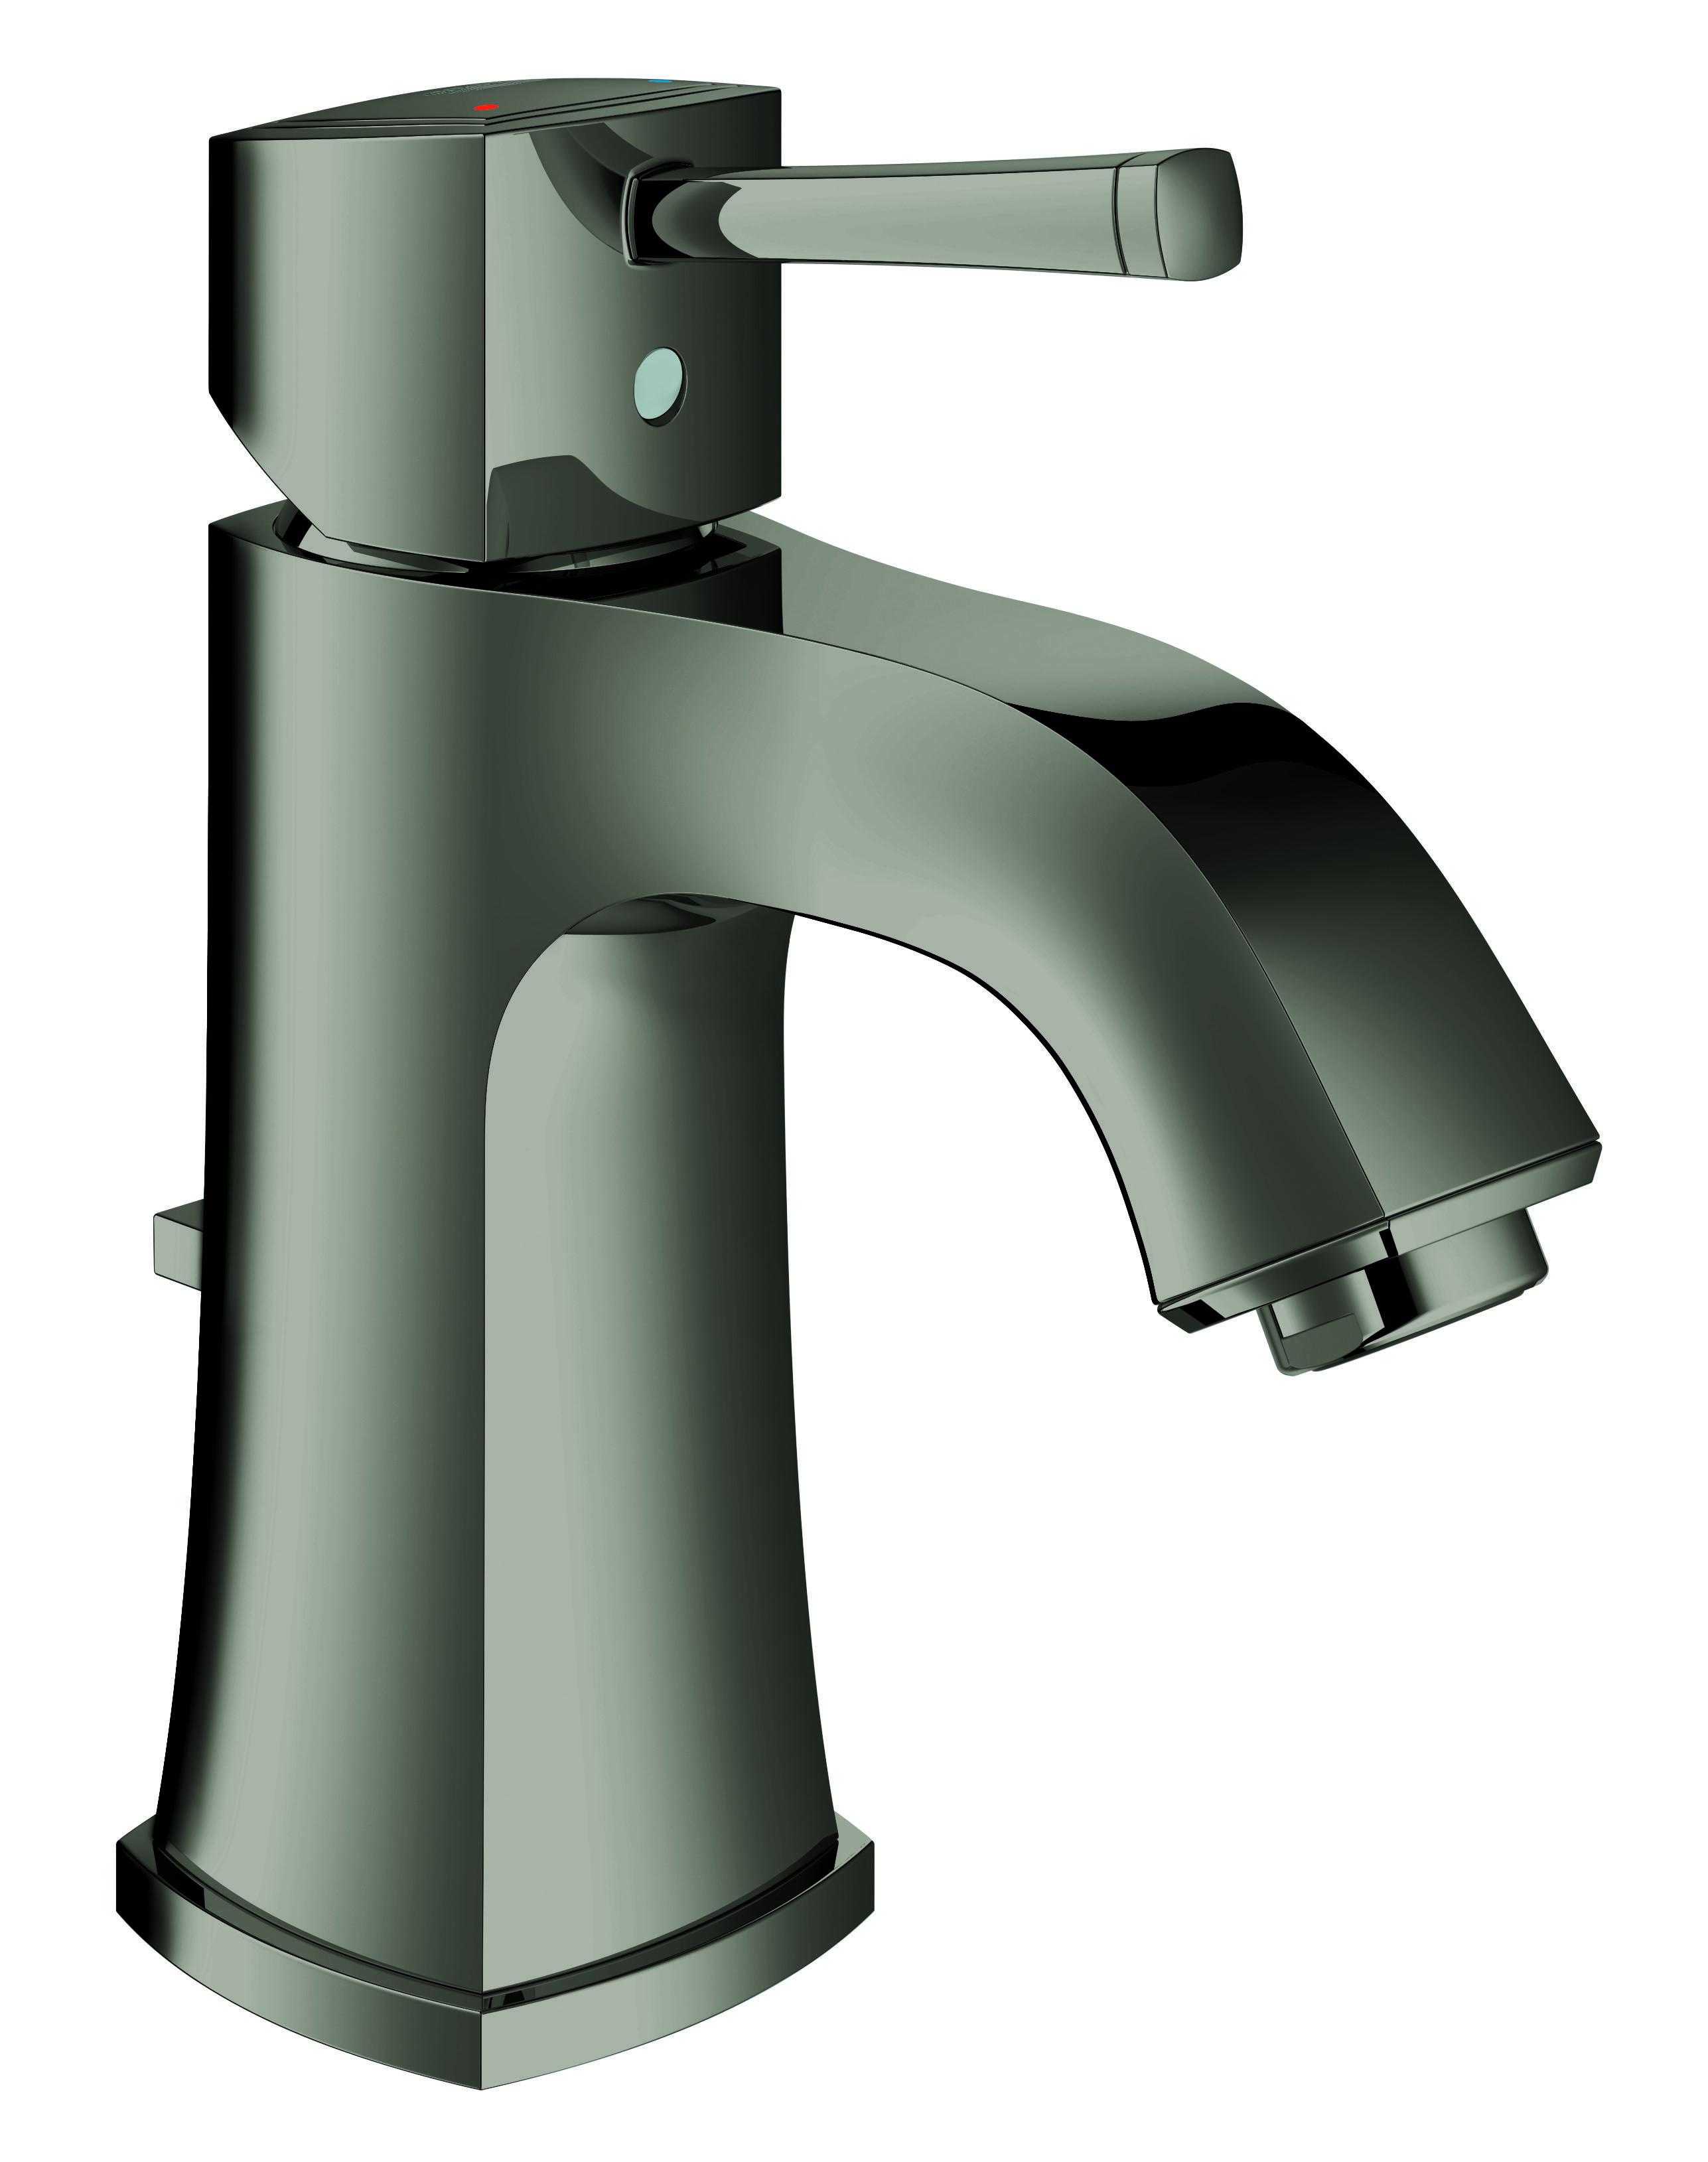 system bathrooms prestige shower ambiente veris ranges grohe